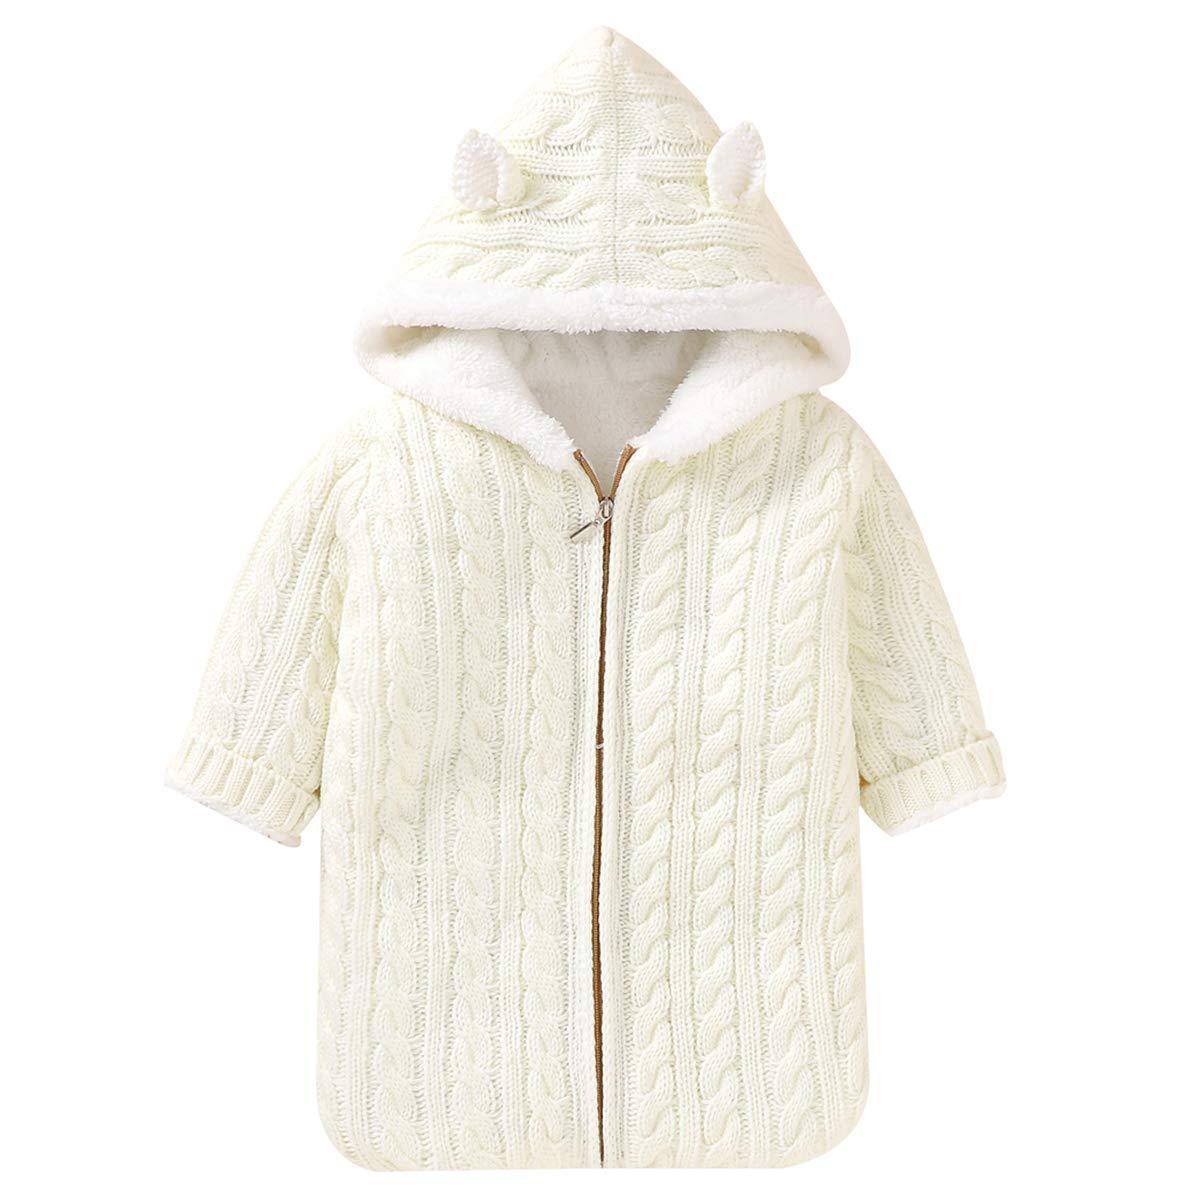 Baby Sleeping Bag Fleece Lined Swaddle Blanket Newborn Infant Knit Stroller Wrap